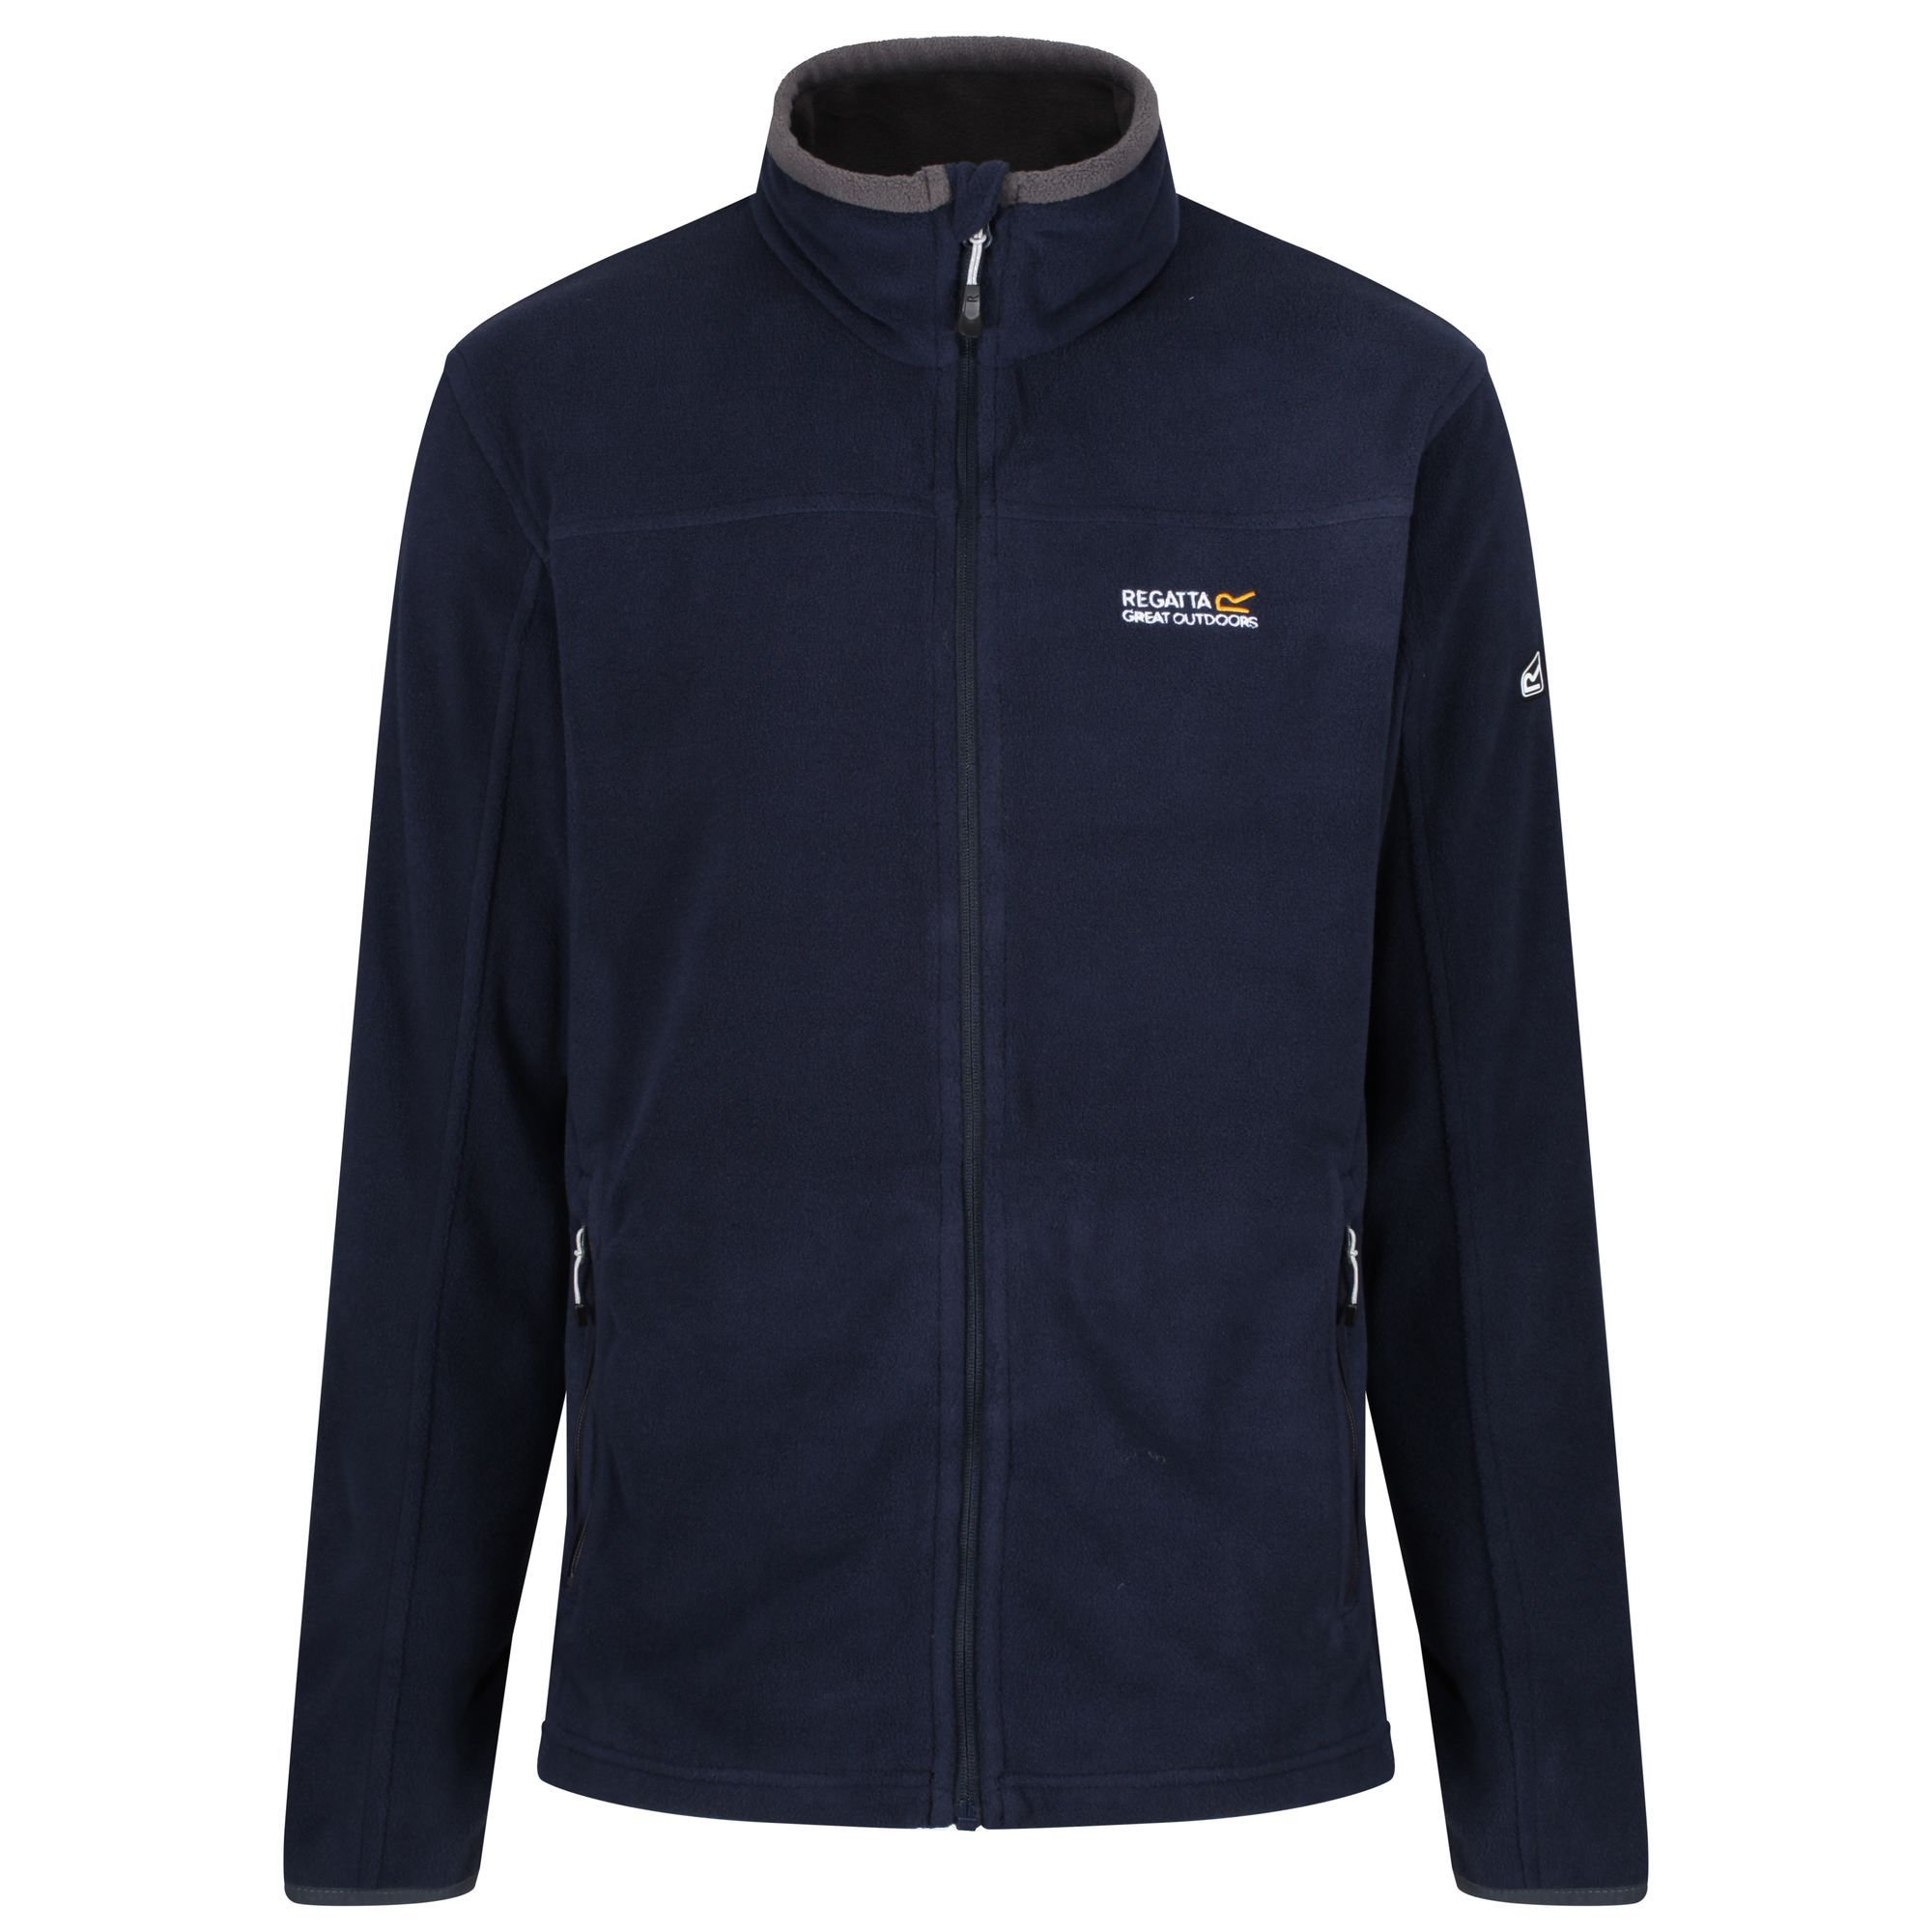 Regatta-Stanton-II-Mens-Warm-Mid-Weight-Full-Zip-Golf-Fleece-Jacket-RRP-40 thumbnail 5